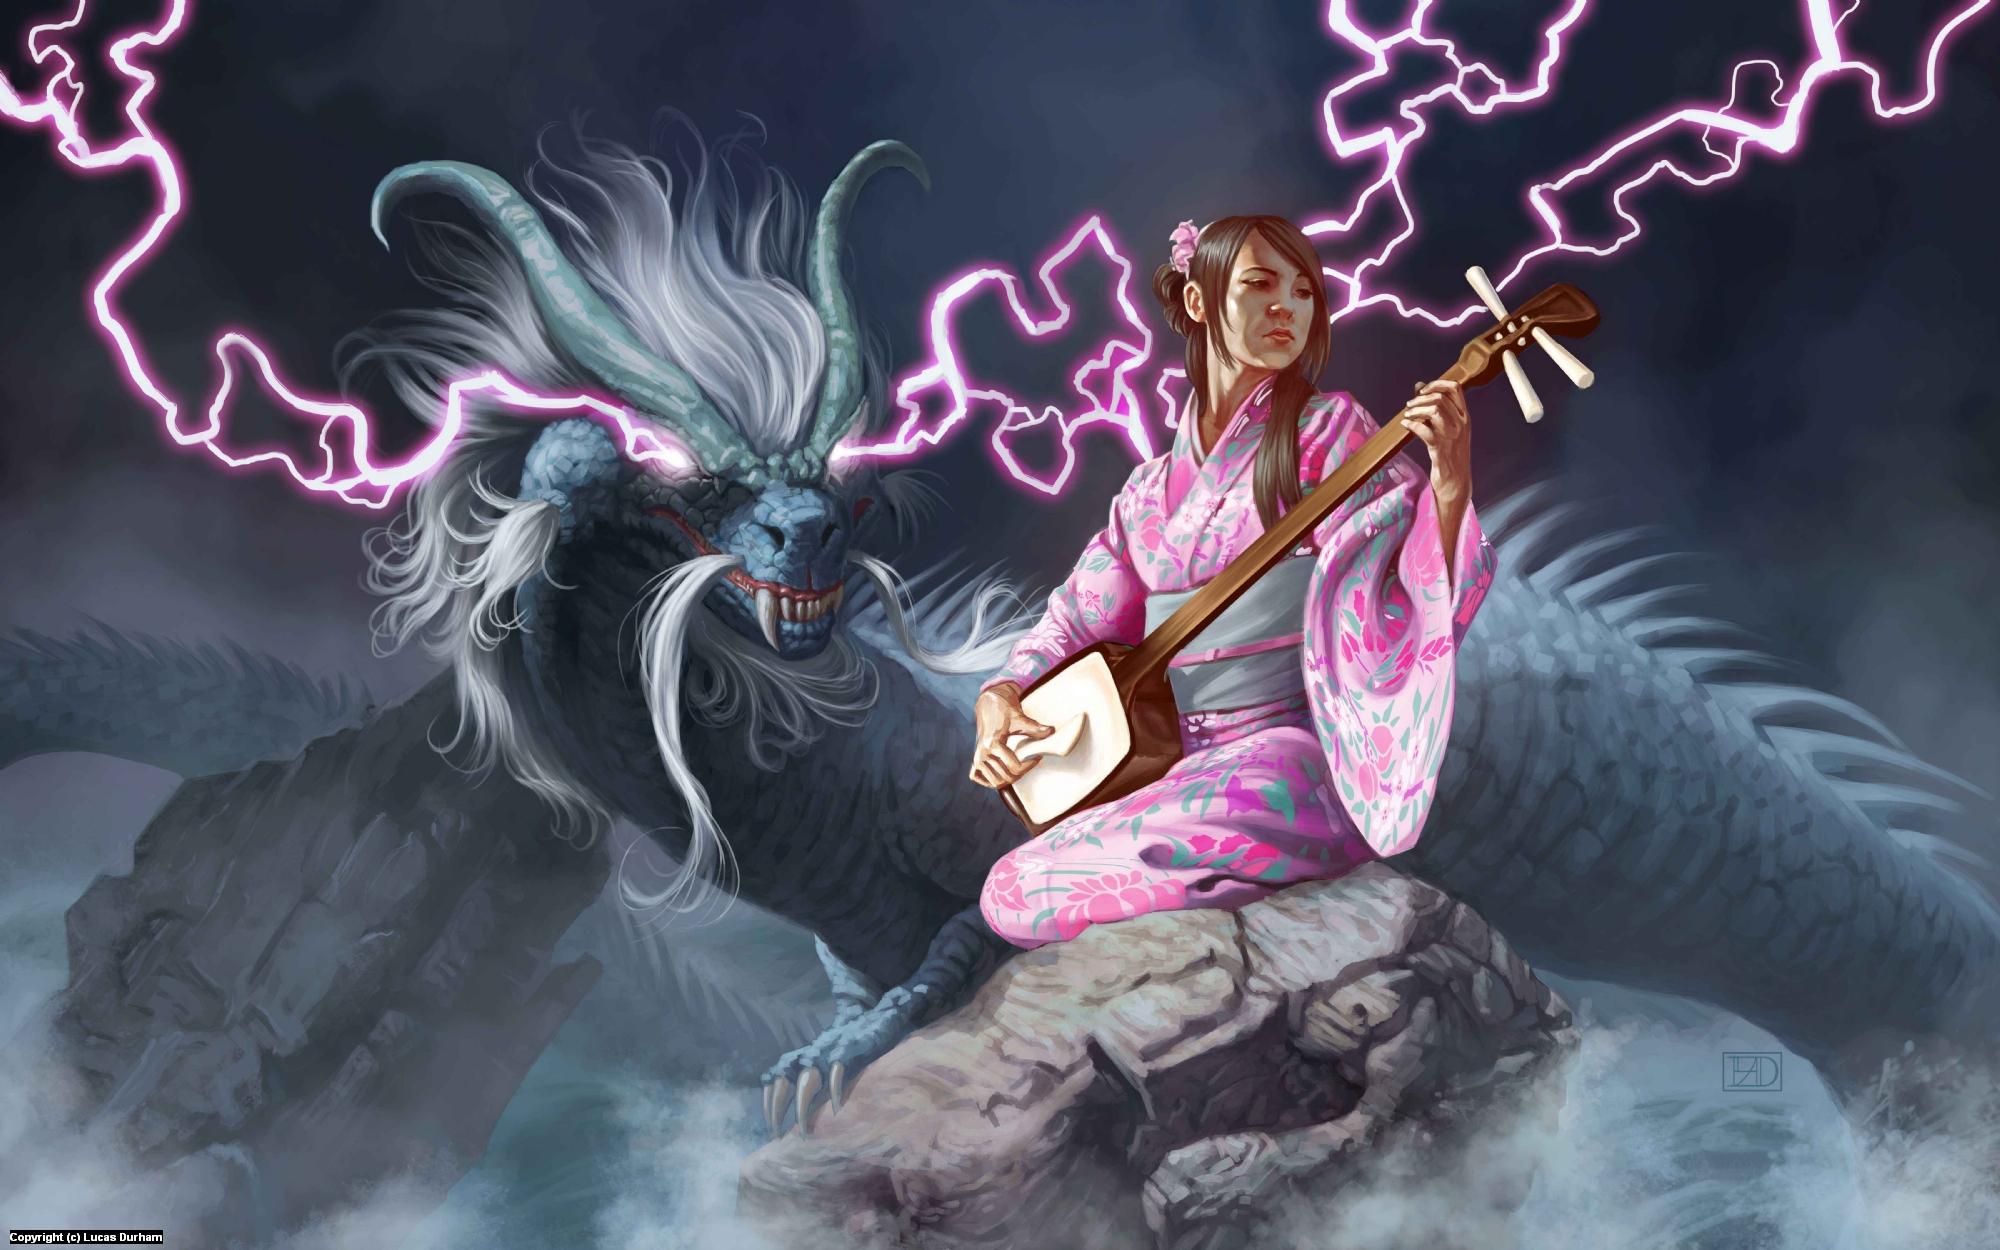 Benzaiten and the Dragon Artwork by Lucas Durham